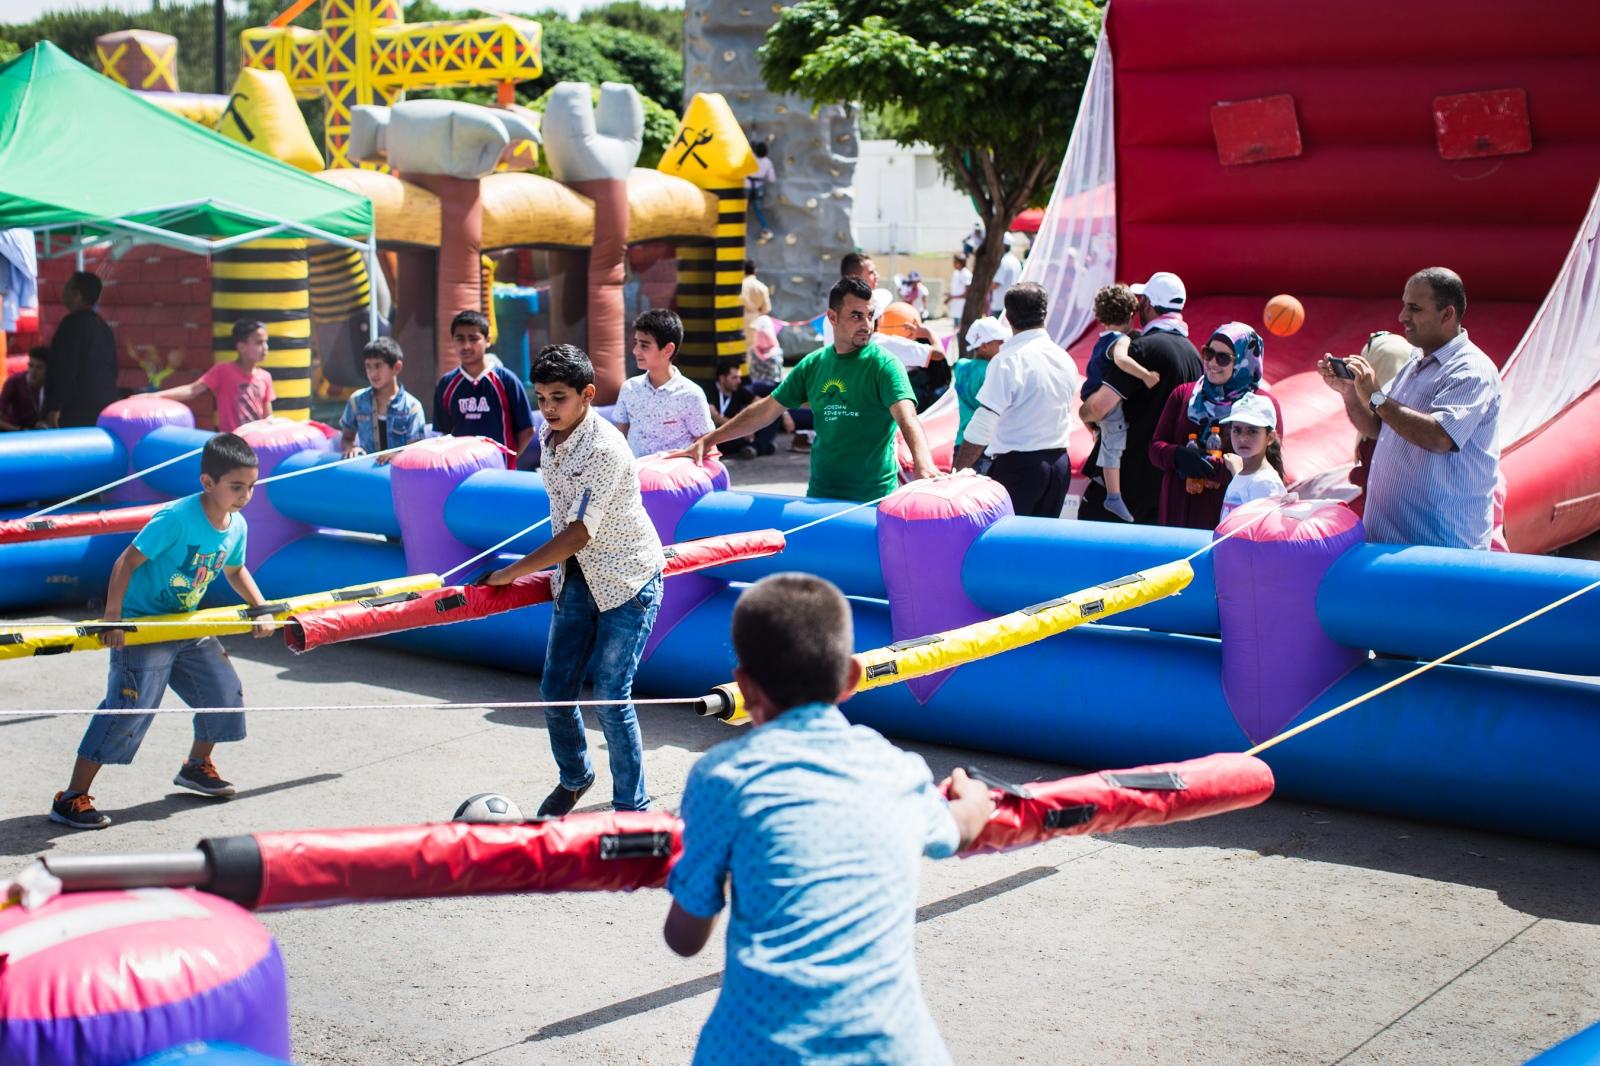 Jordanian boys play human foosball in a children's area during celebrations marking the 100th anniversary of the Great Arab Revolt in Amman, Jordan, on June 3, 2016.